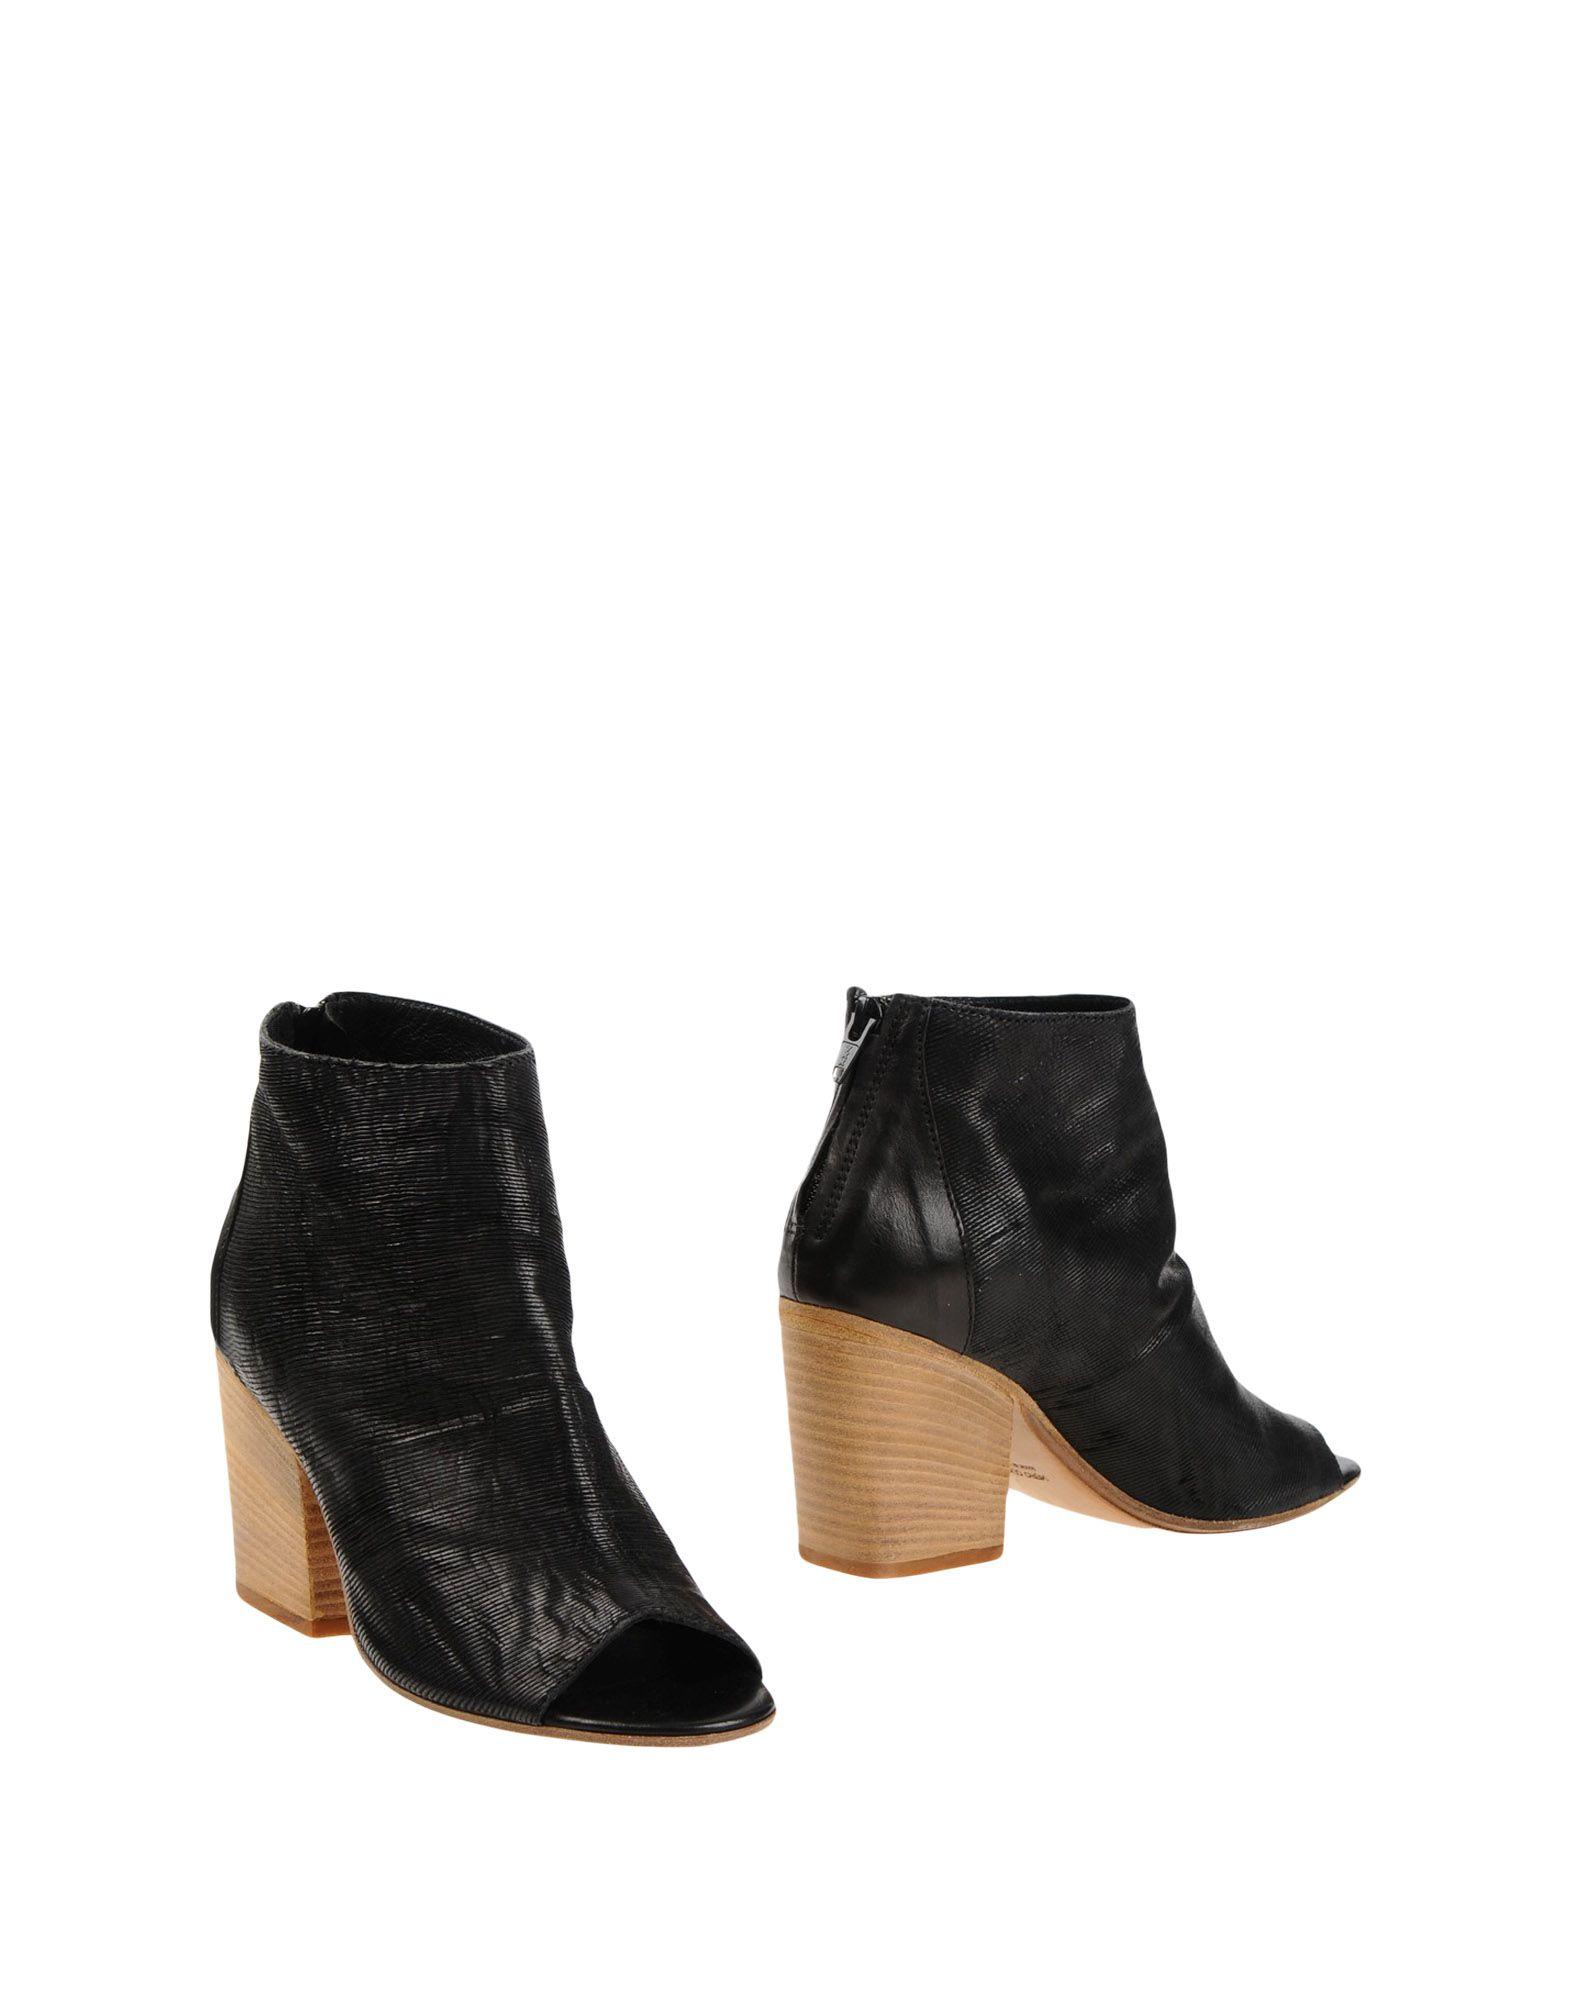 Moda Stivaletti Fru.It Donna - 11399249TJ